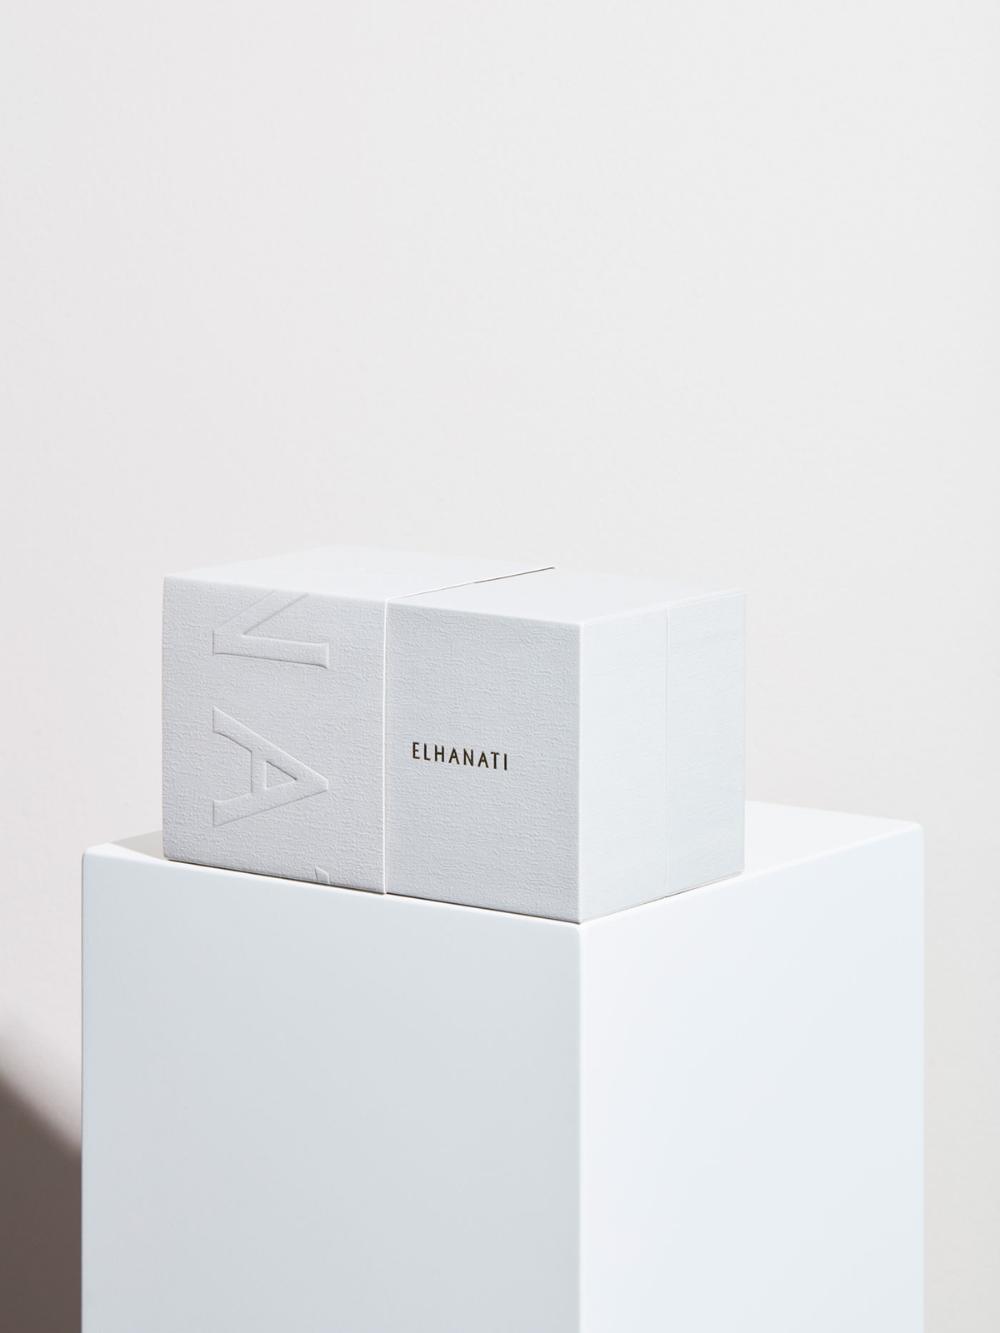 Download Packaging Jewelry Box Homework Jewelry Packaging Design Box Packaging Design Jewelry Packaging